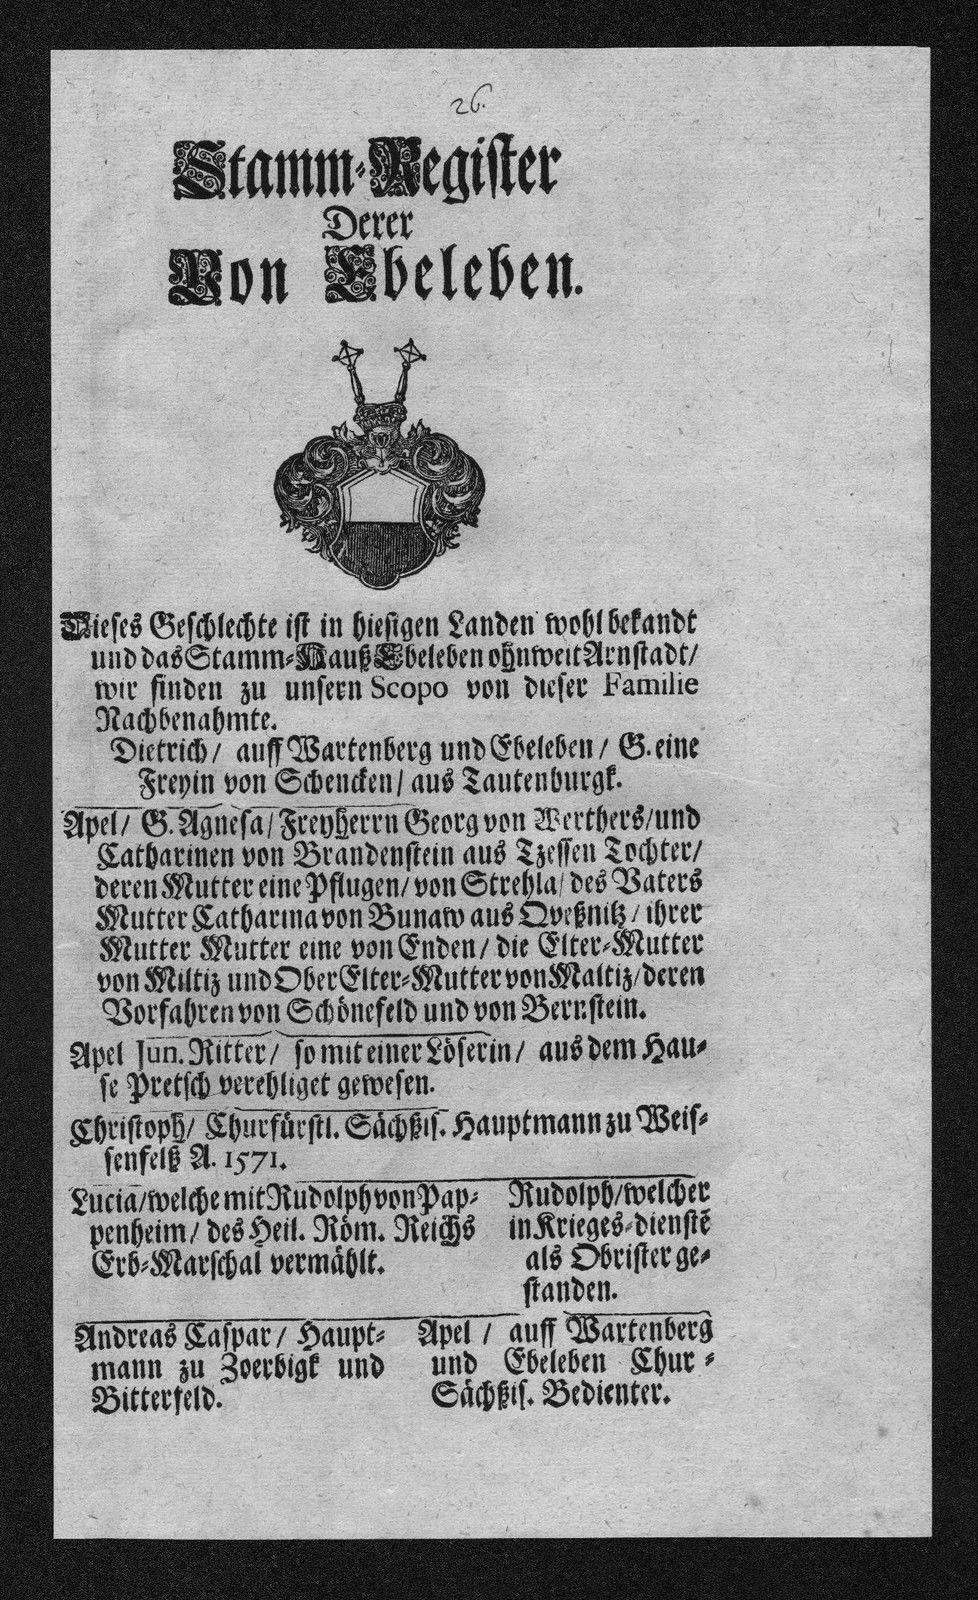 Ebeleben Stammbaum Ahnentafel family tree Wappen coat